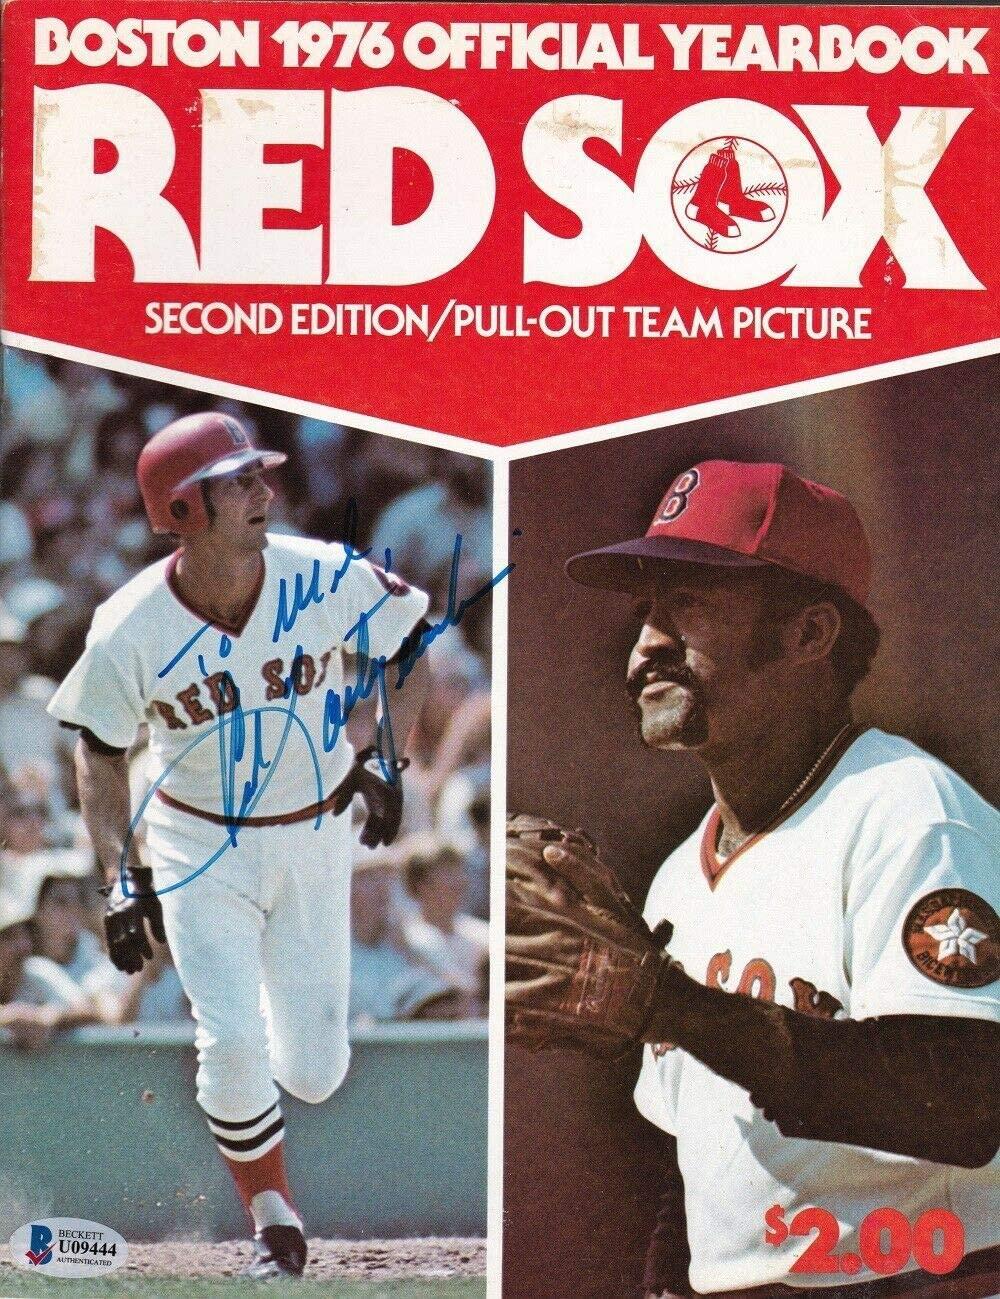 Carl Yastrzemski Autographed Signed Boston 1976 Official Yearbook Magazine Beckett